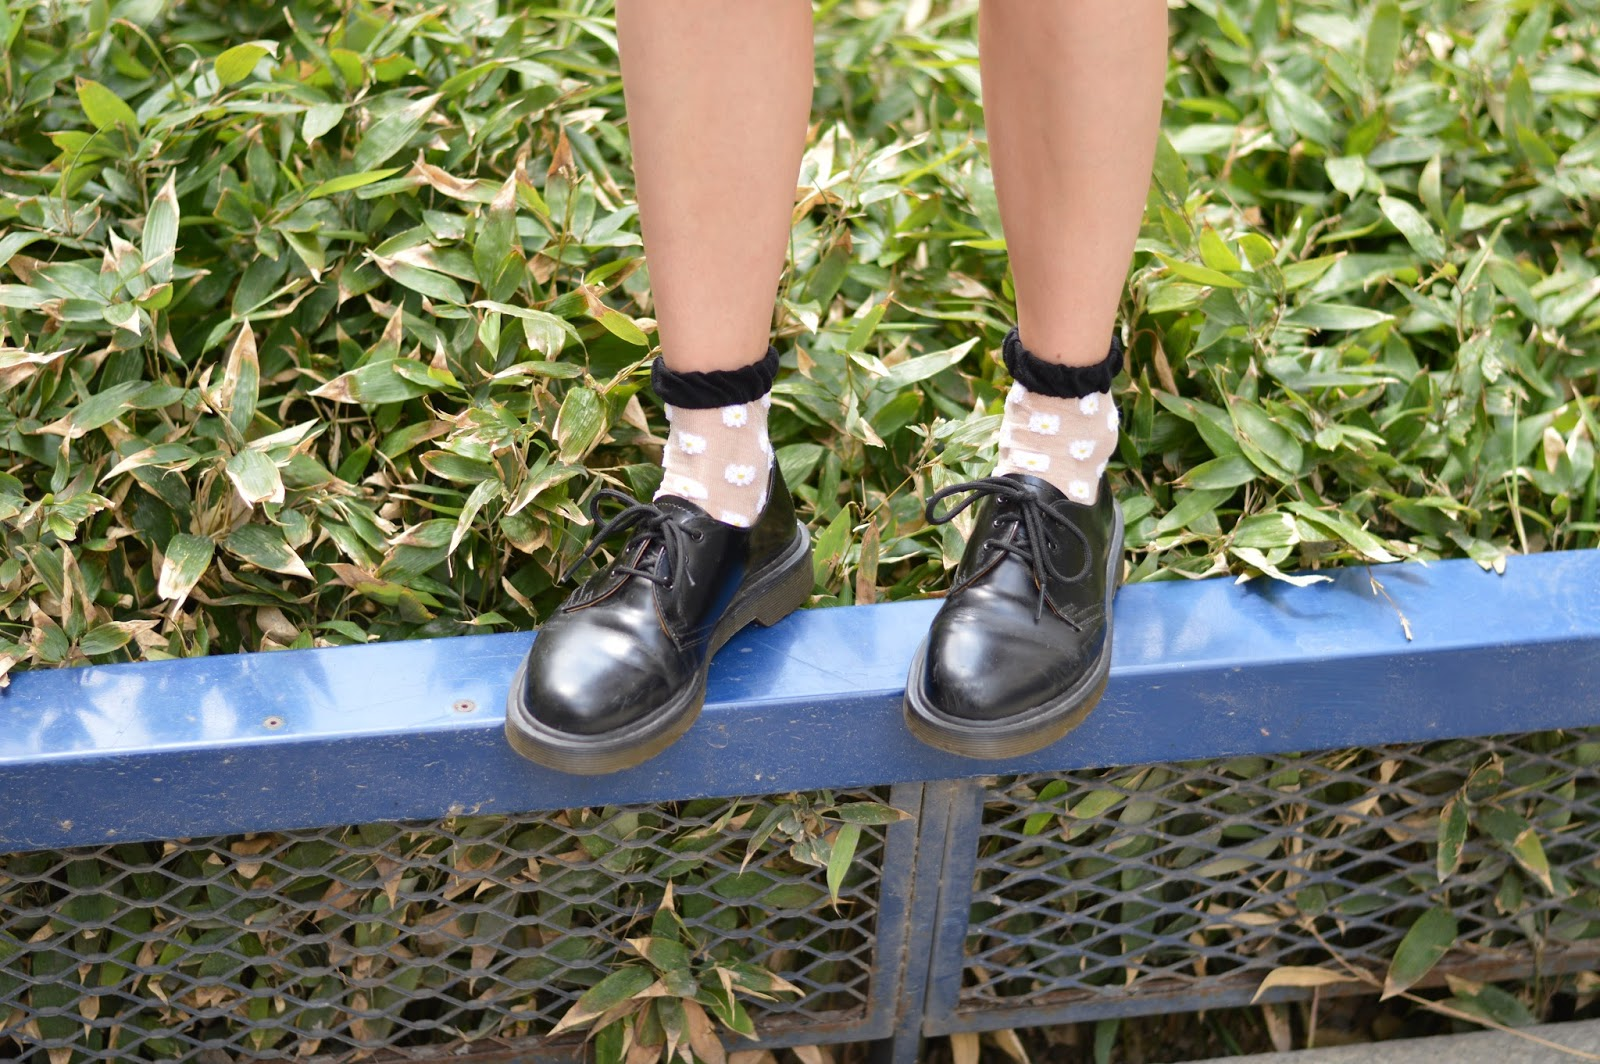 Nineties grunge Dr Martens black shoes and Primark daisy socks